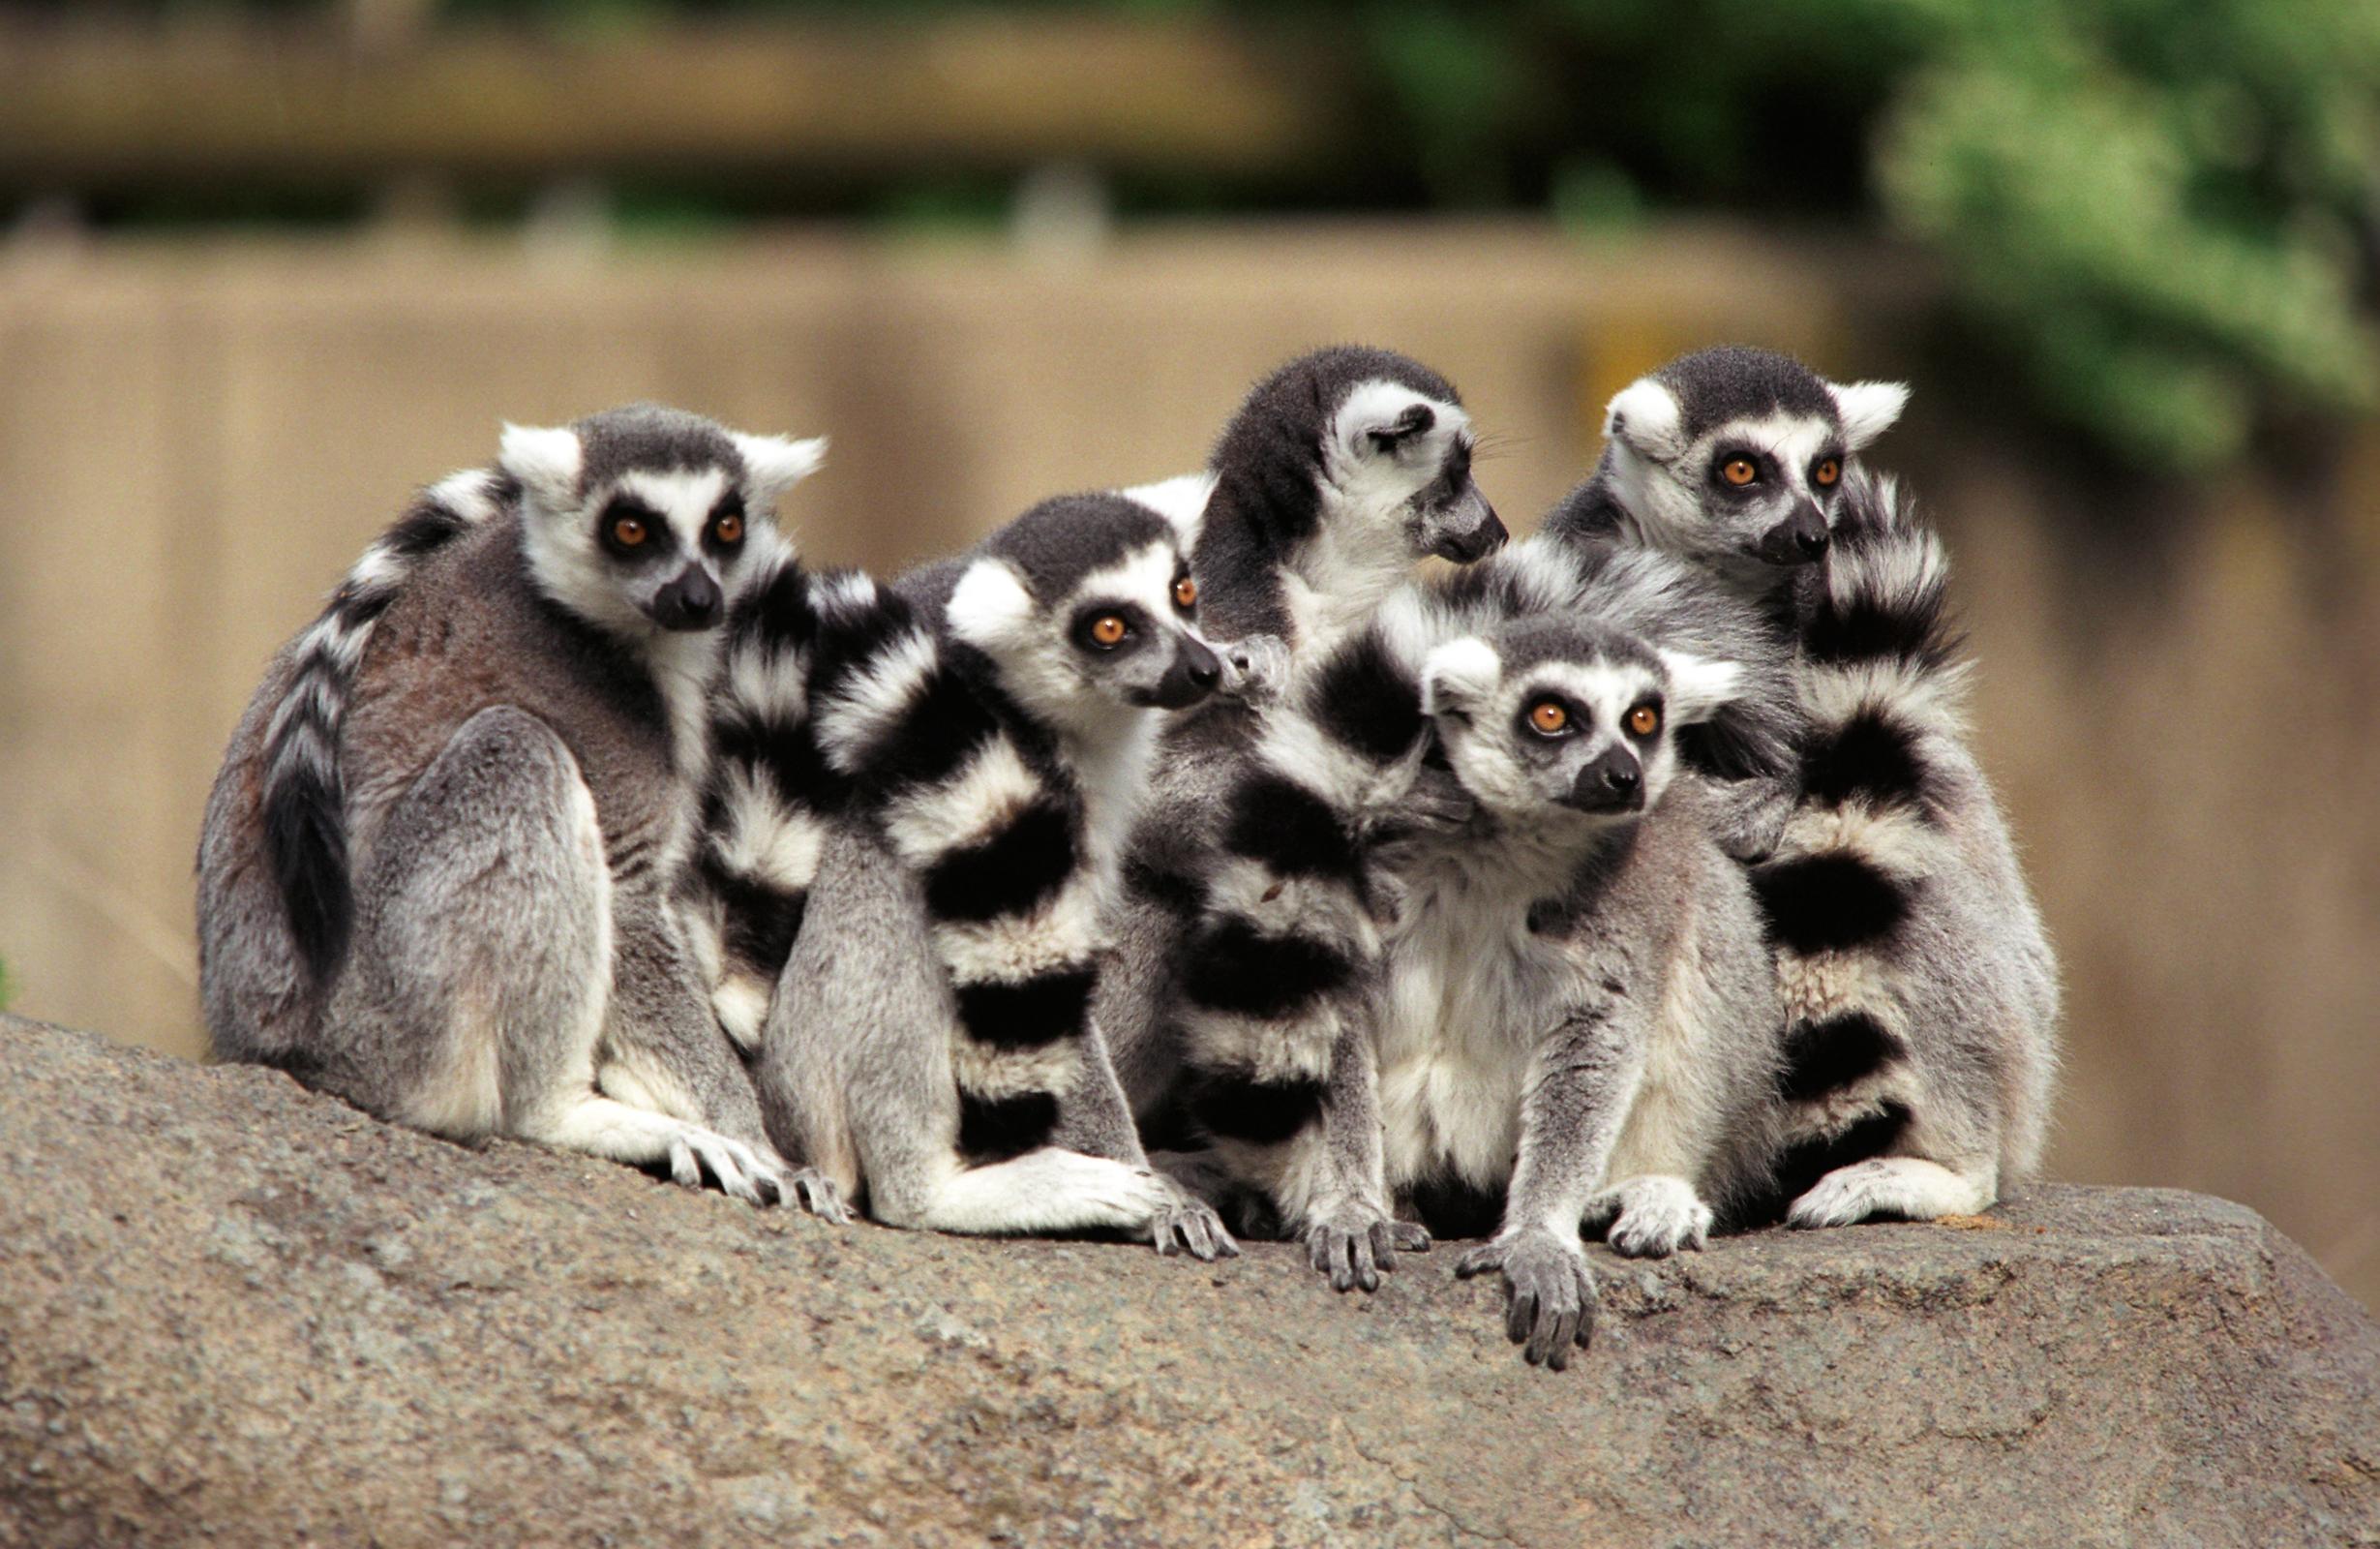 Lemurs in a huddle at Cincinnati Zoo & Botanical Garden.